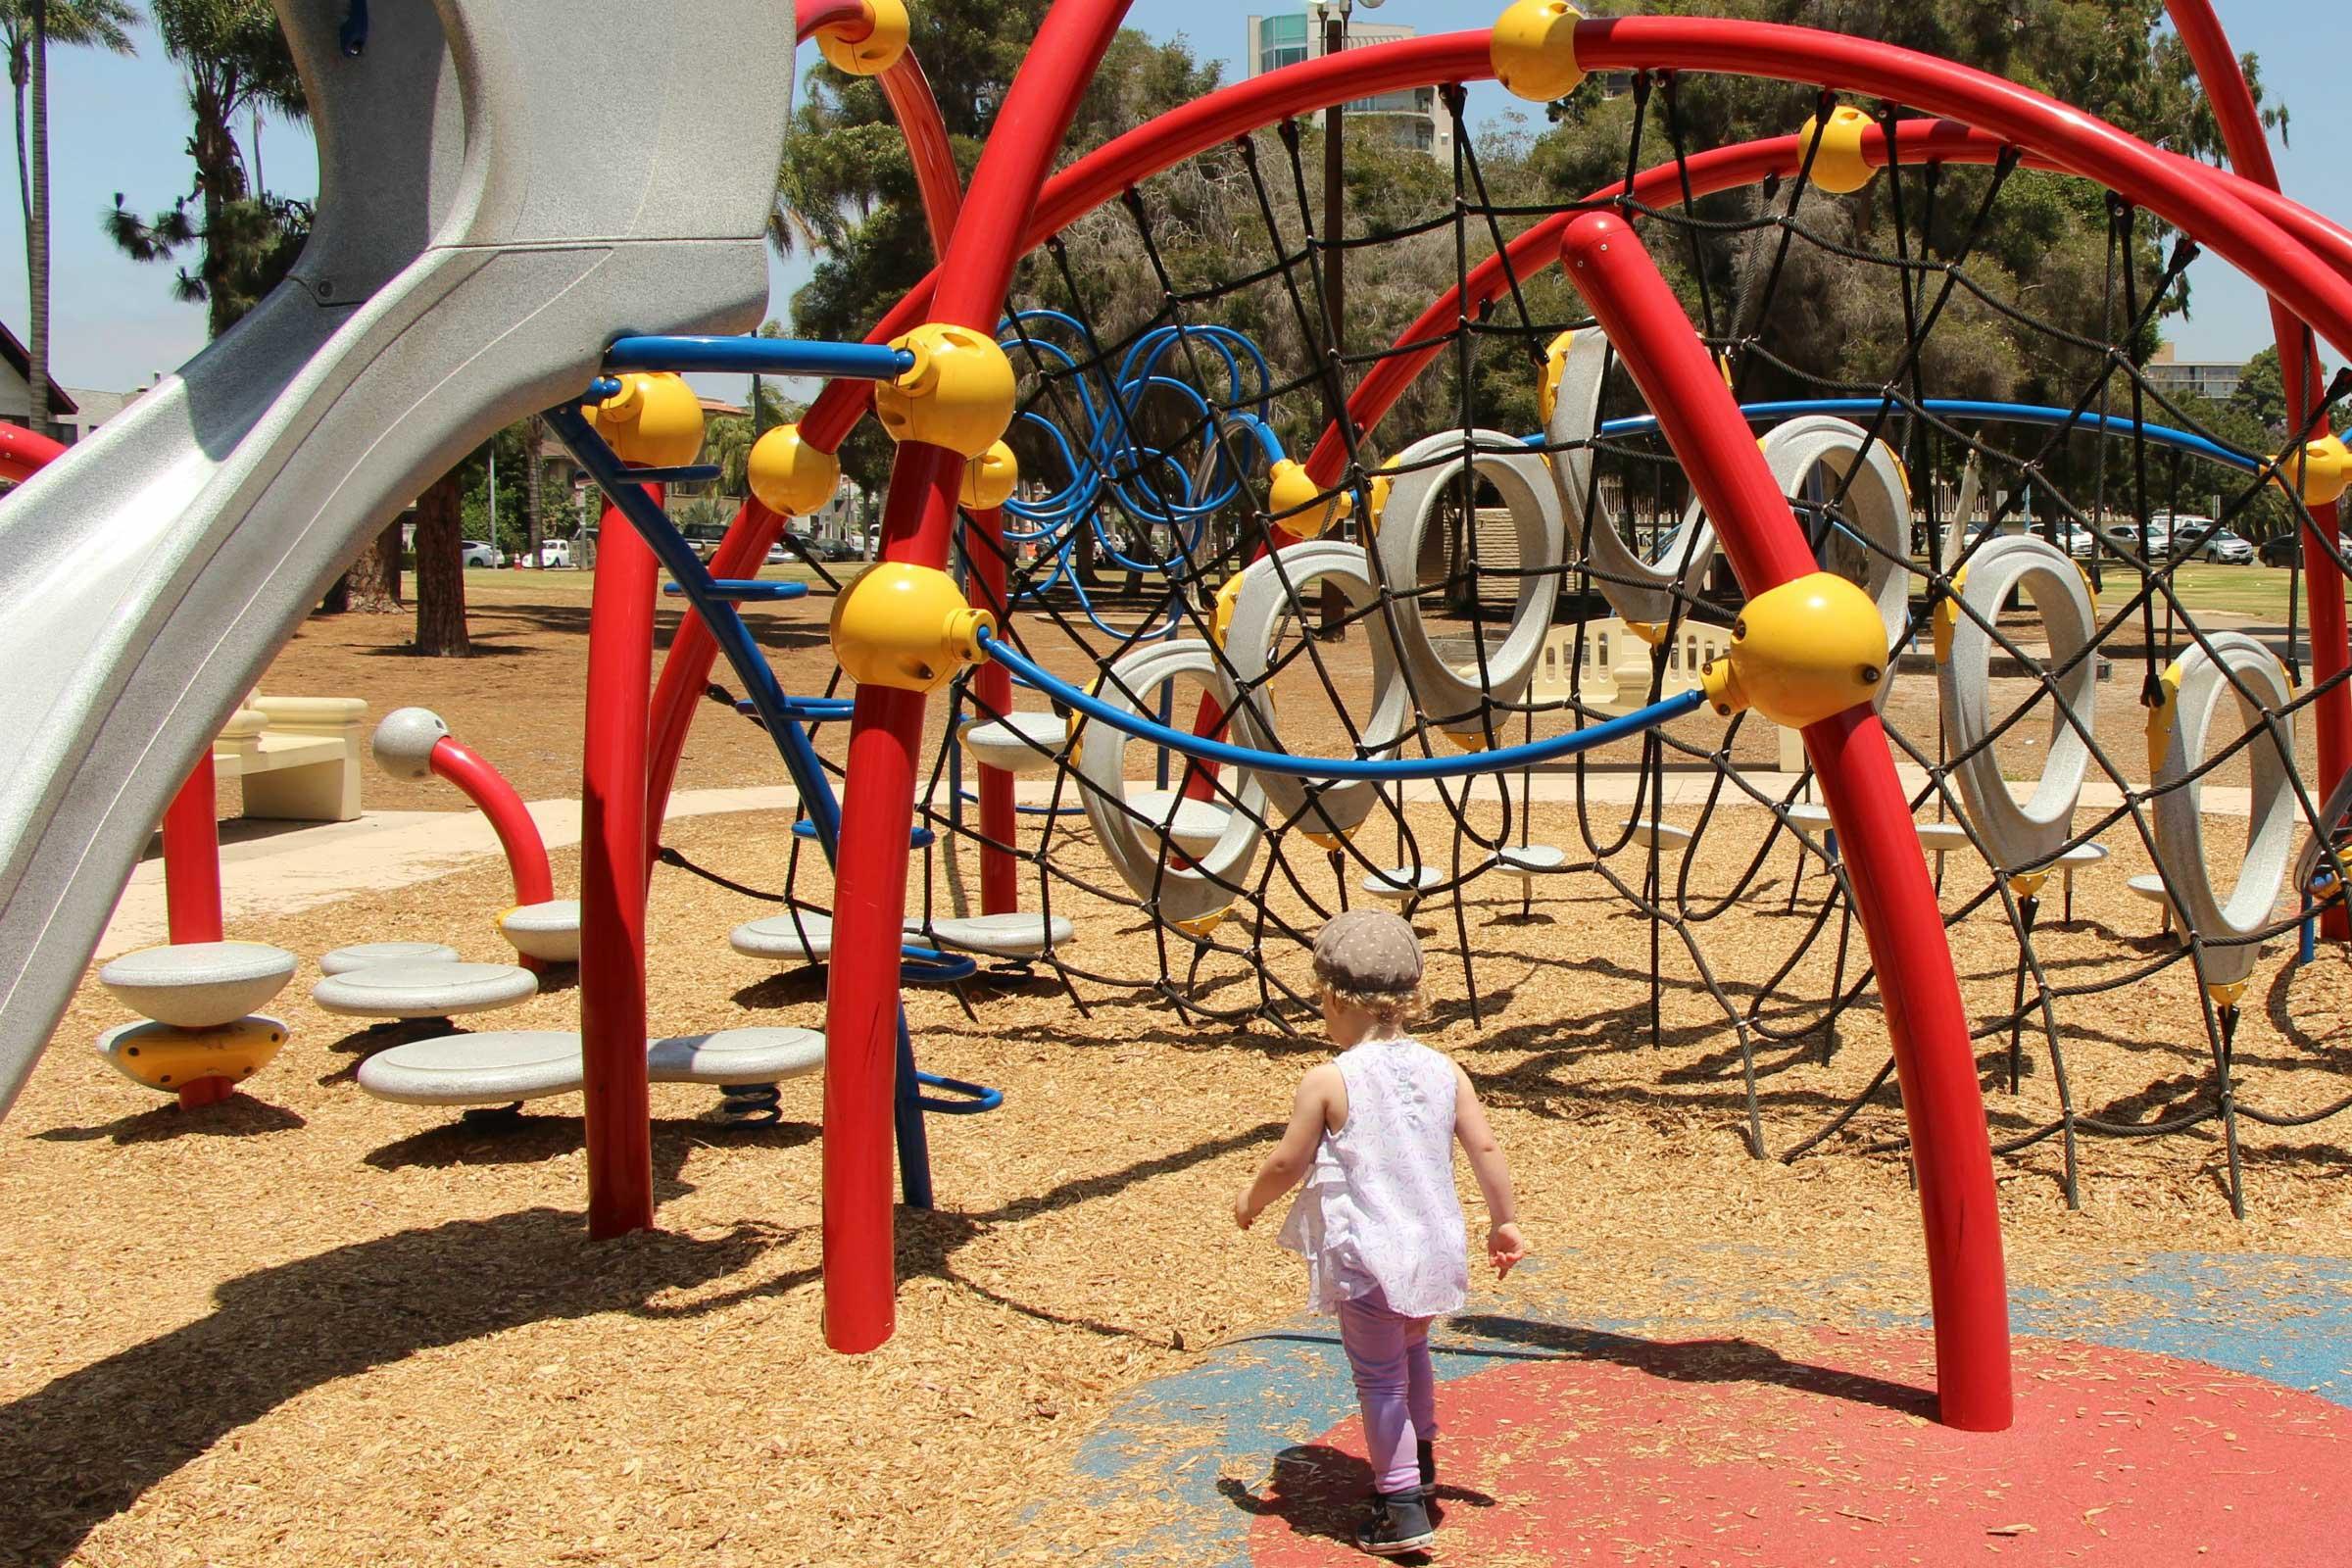 Playground in Balboa Park San Diego